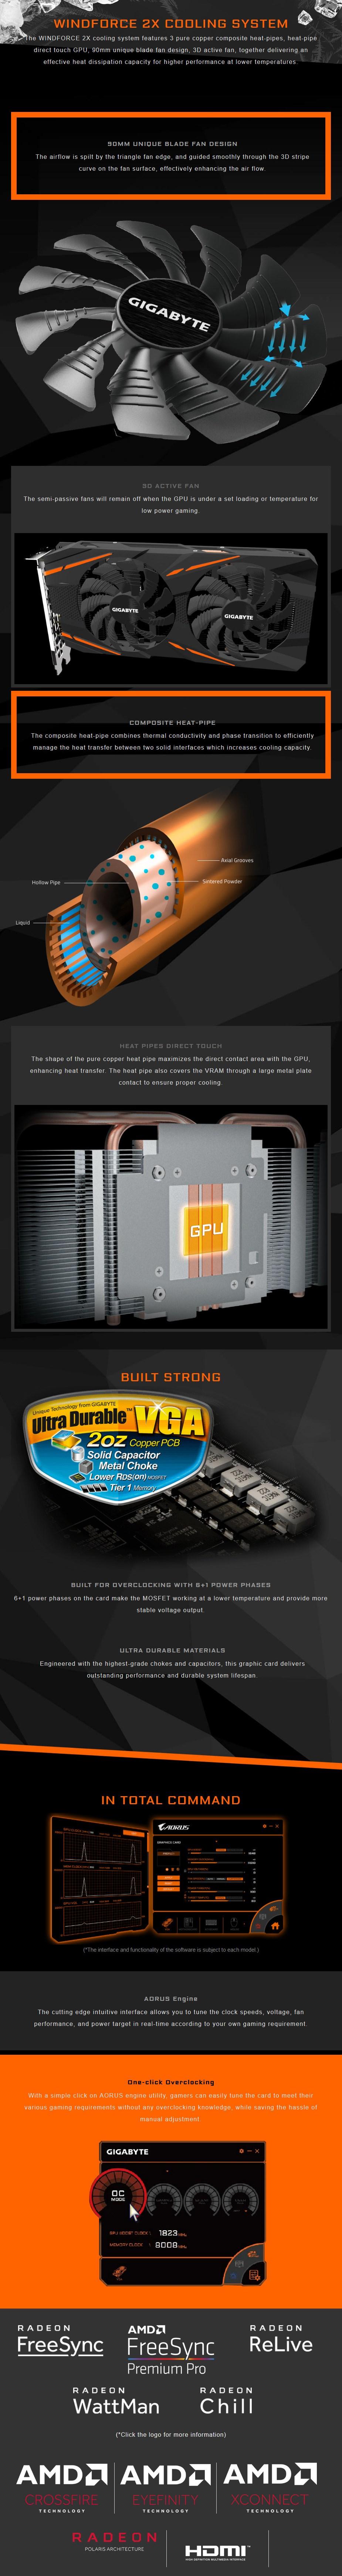 gigabyte-radeon-rx-570-gaming-v2-8gb-video-card-ac34370-6.jpg